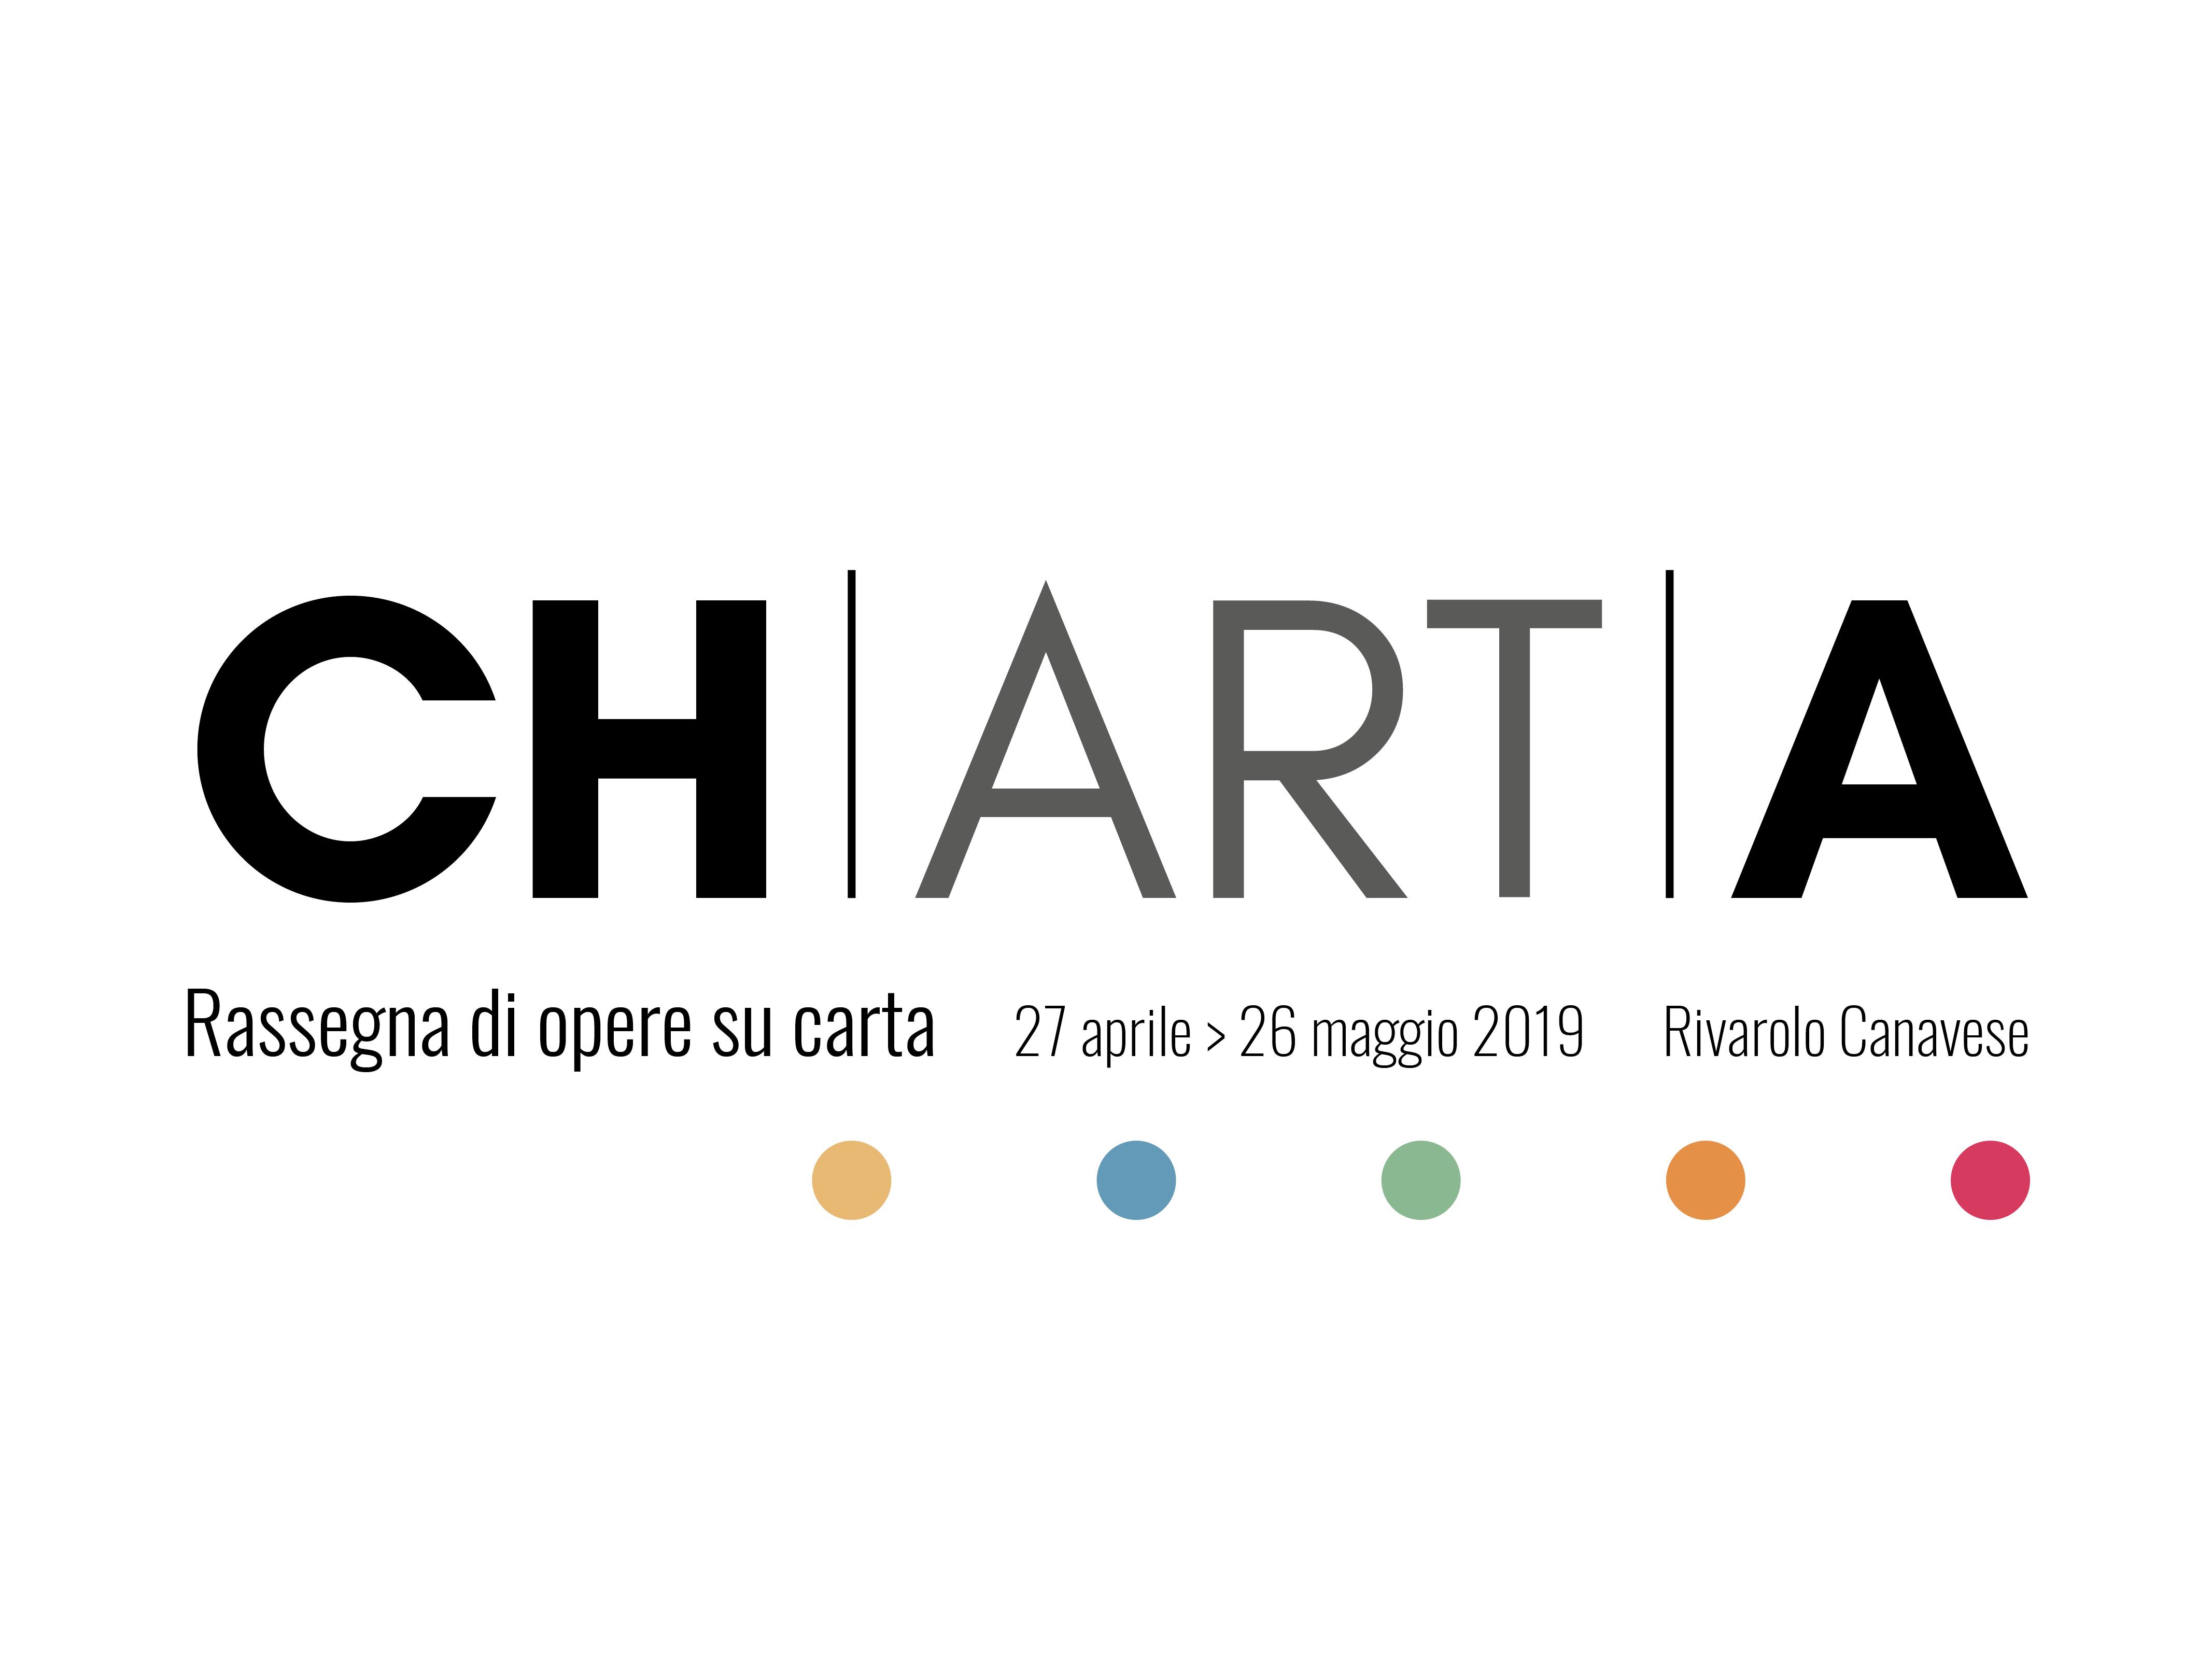 CH|ART|A - Rewiew of paper artworks